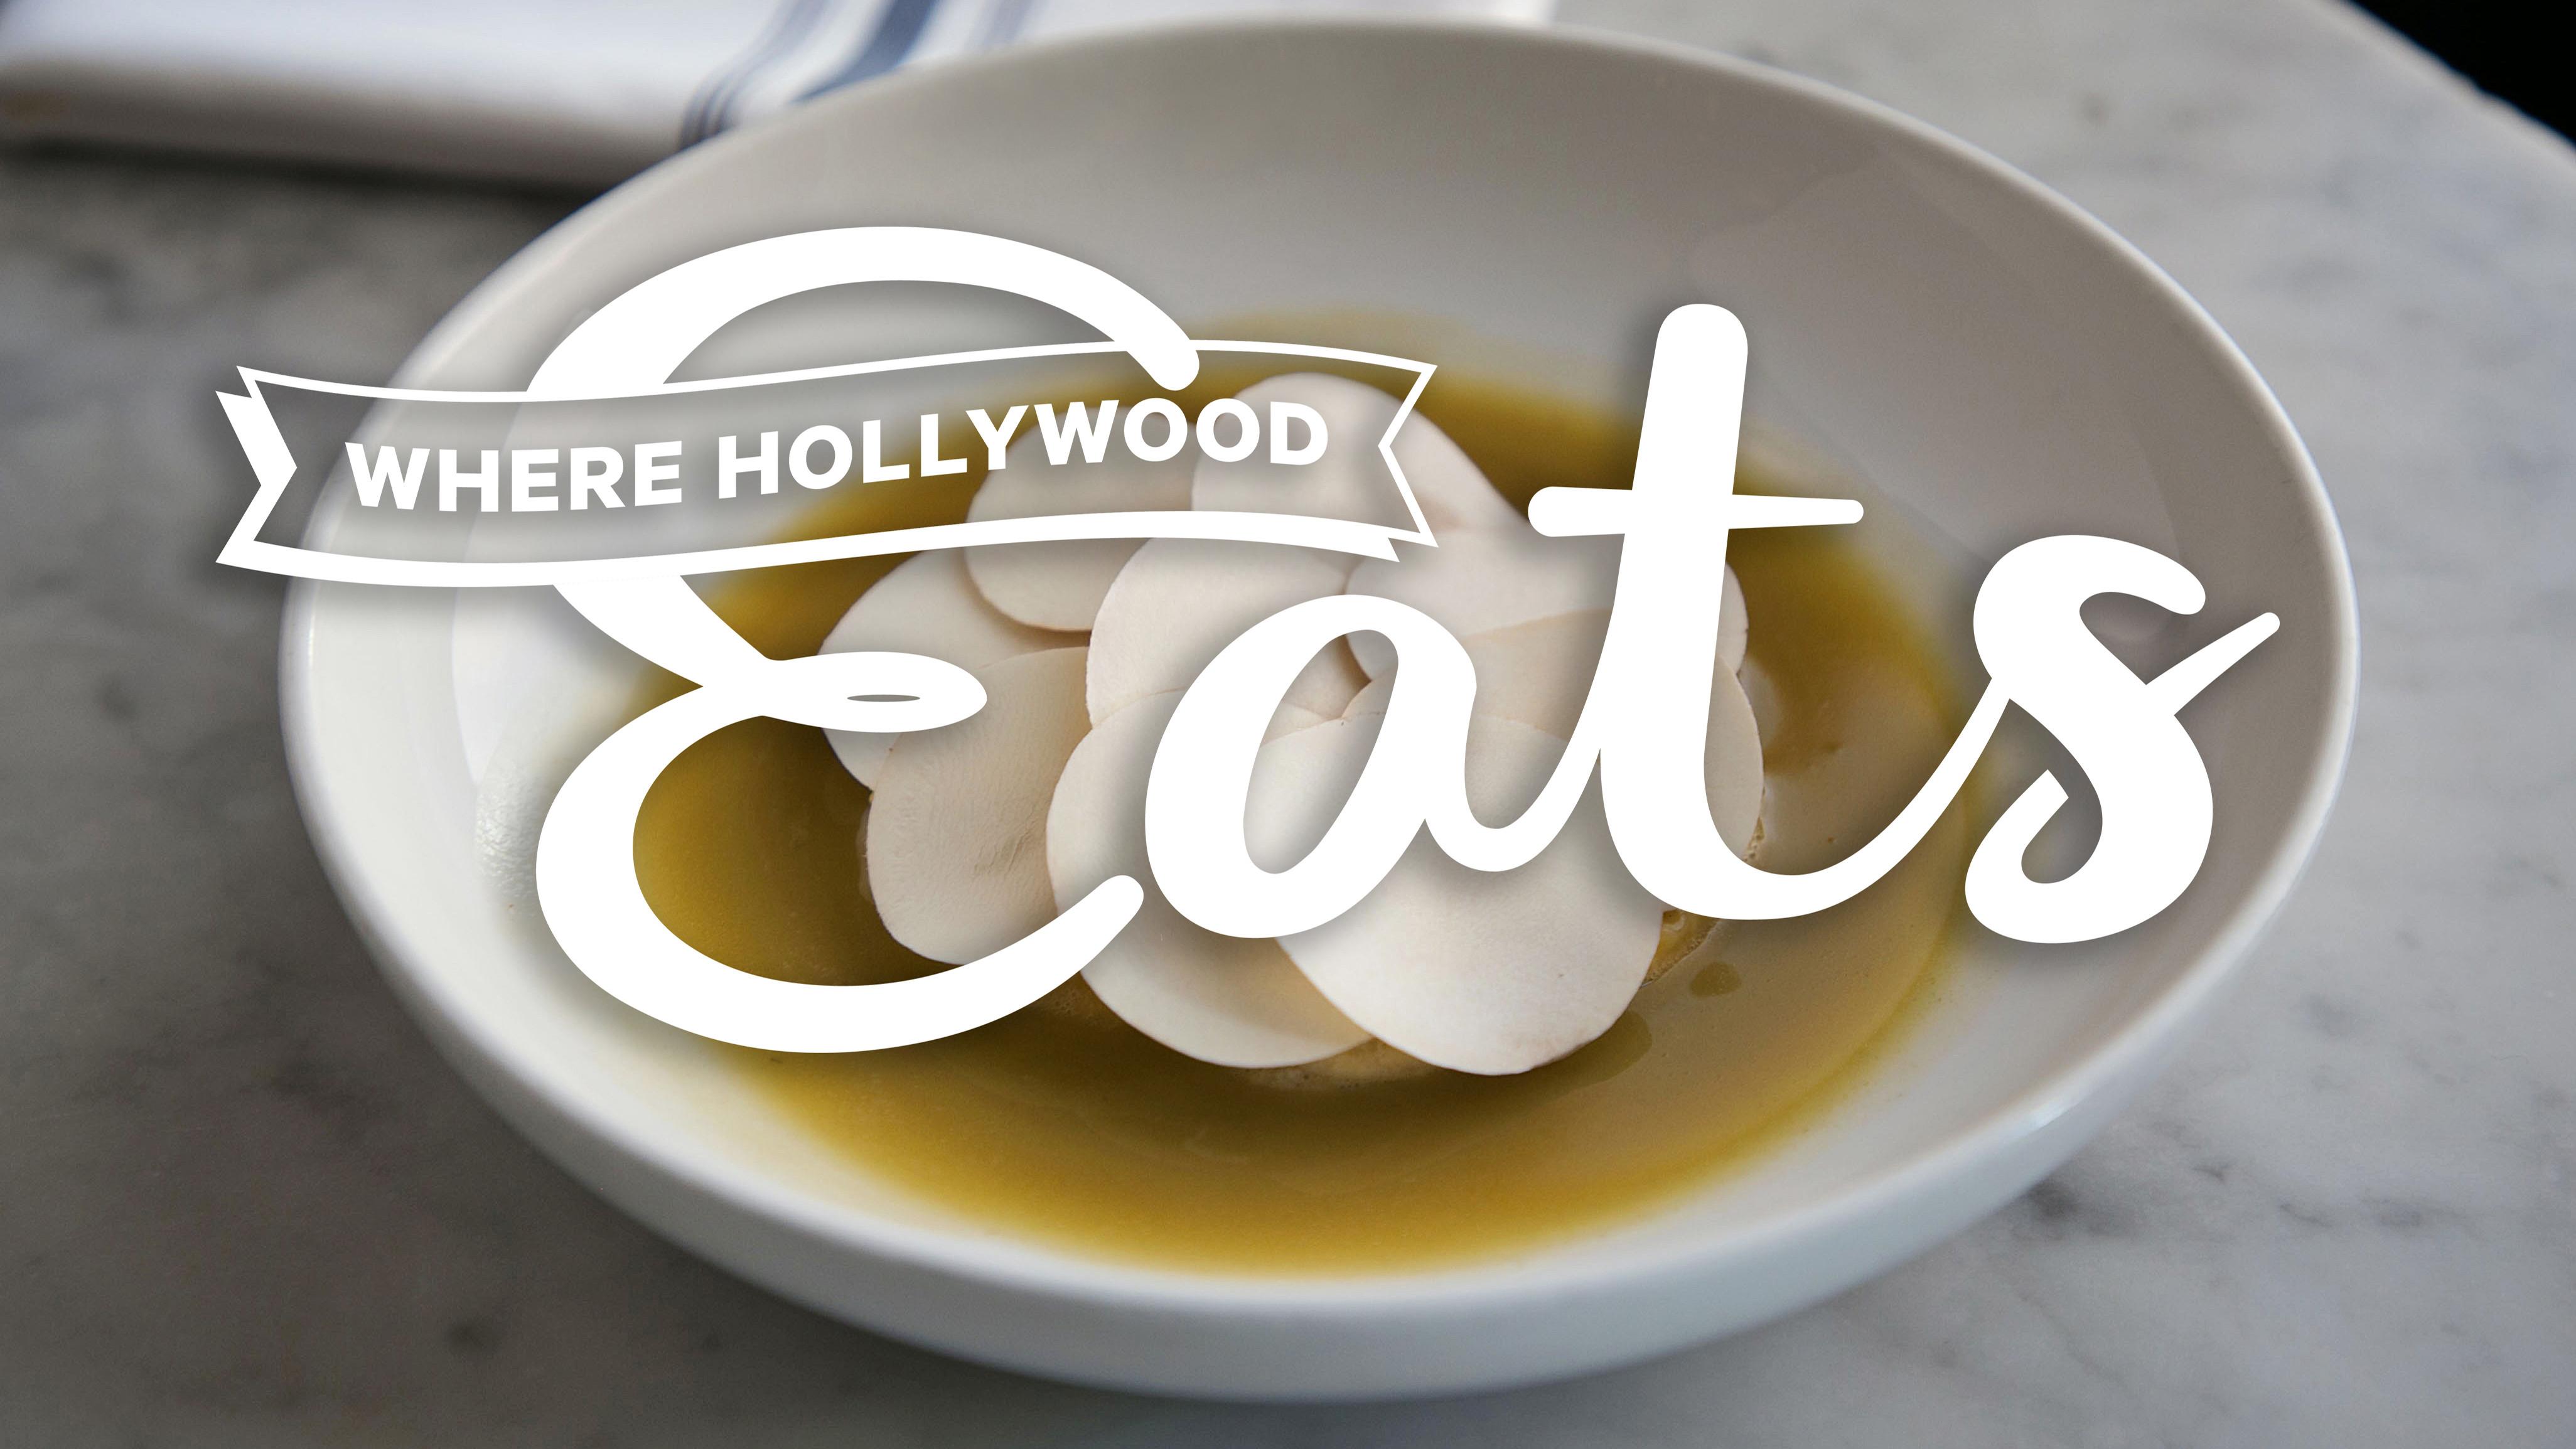 Estela: Where Hollywood Eats in New York City